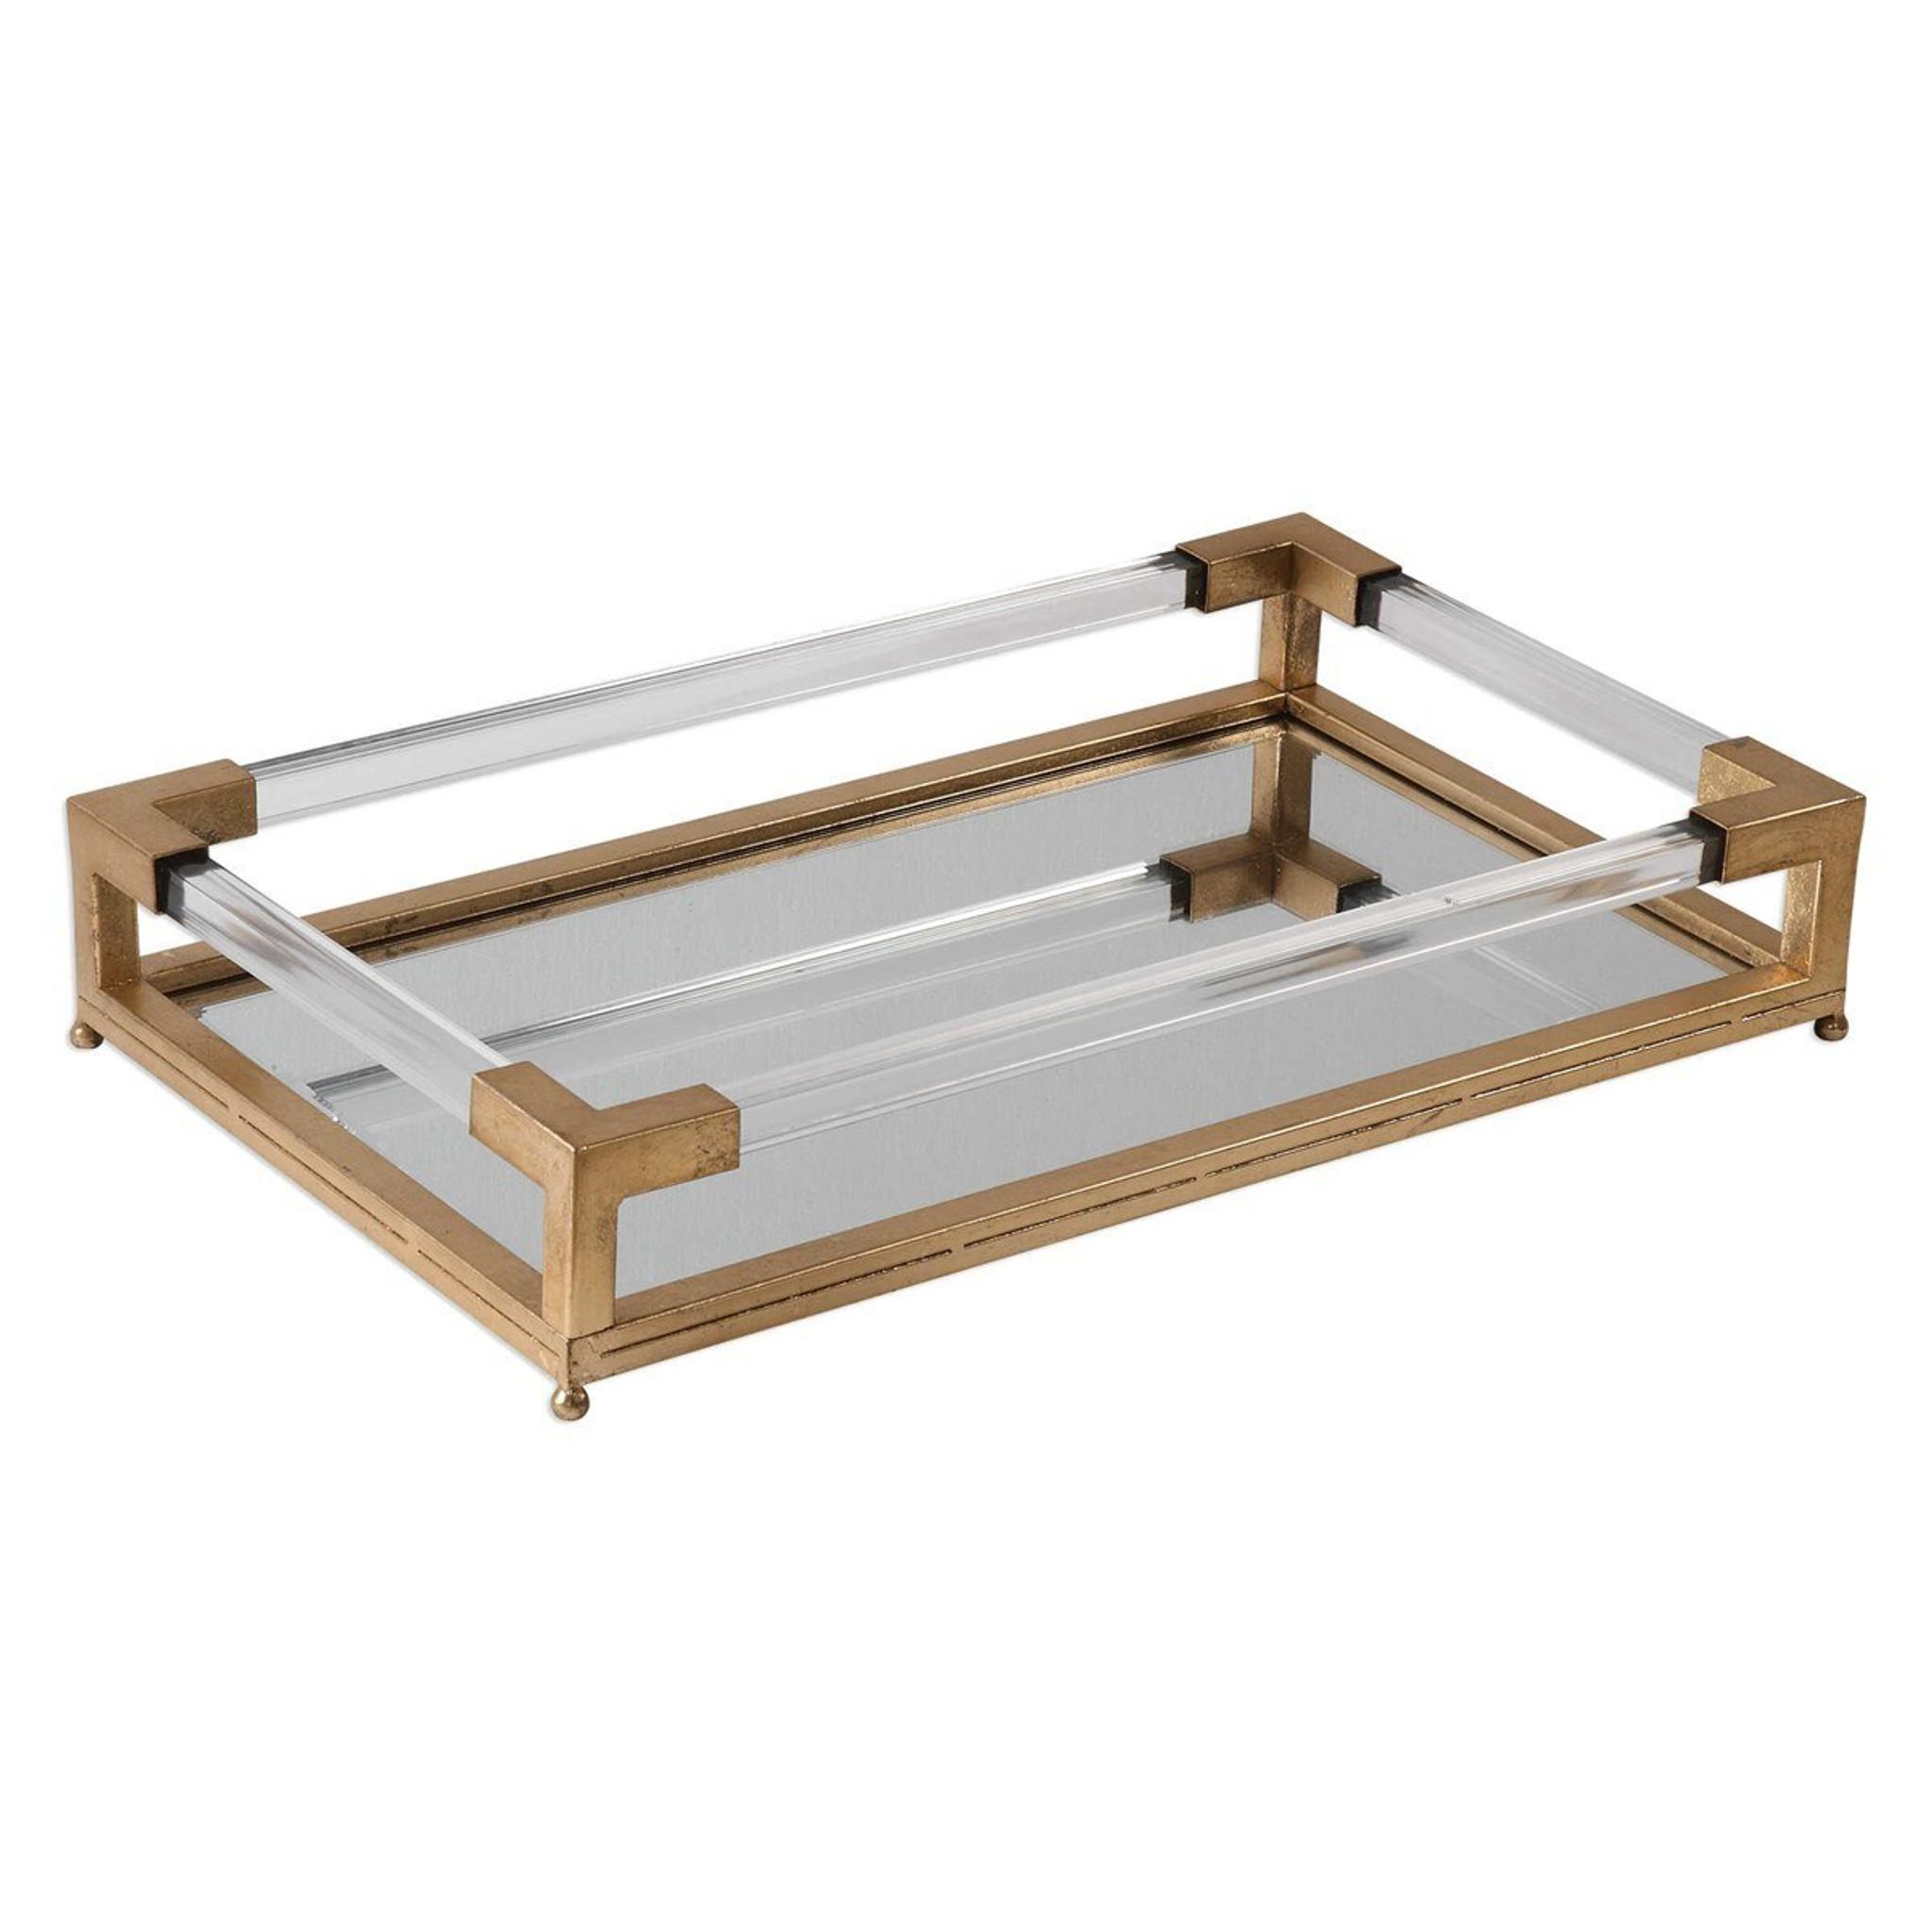 gold rectangular mirrored acrylic serving platter decorative tray uttermost balkan